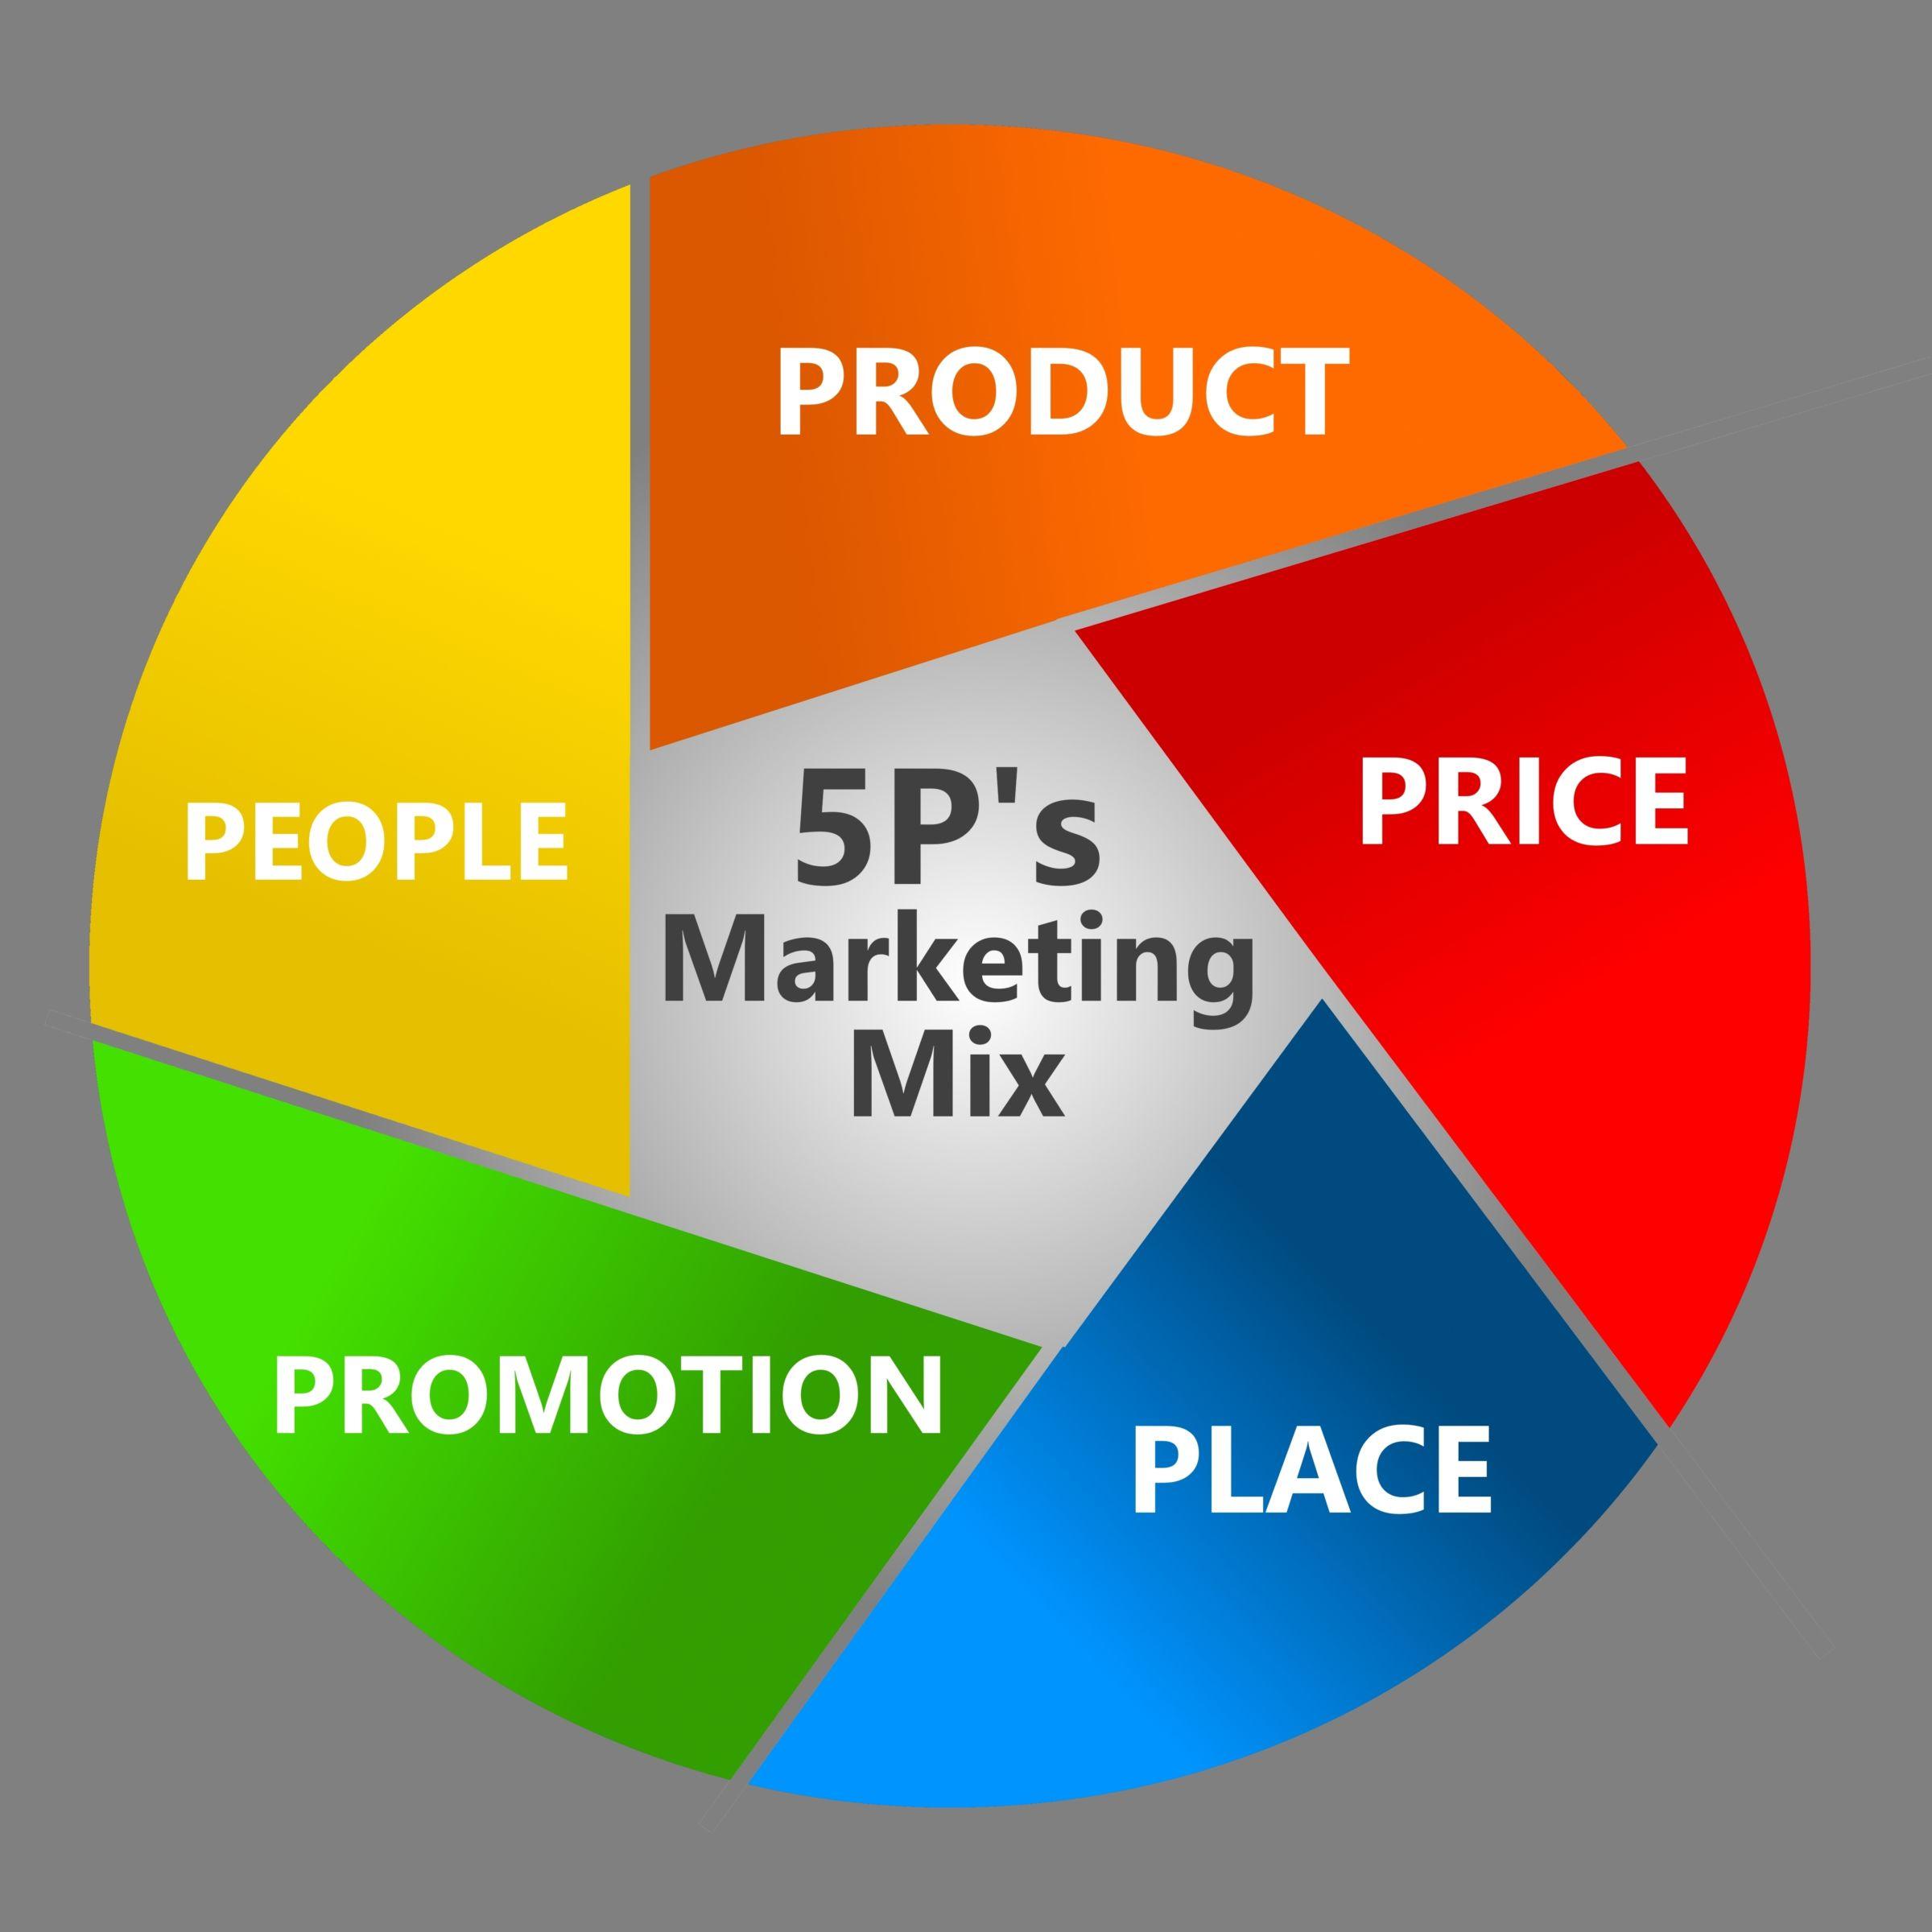 5P's im Marketing Mix